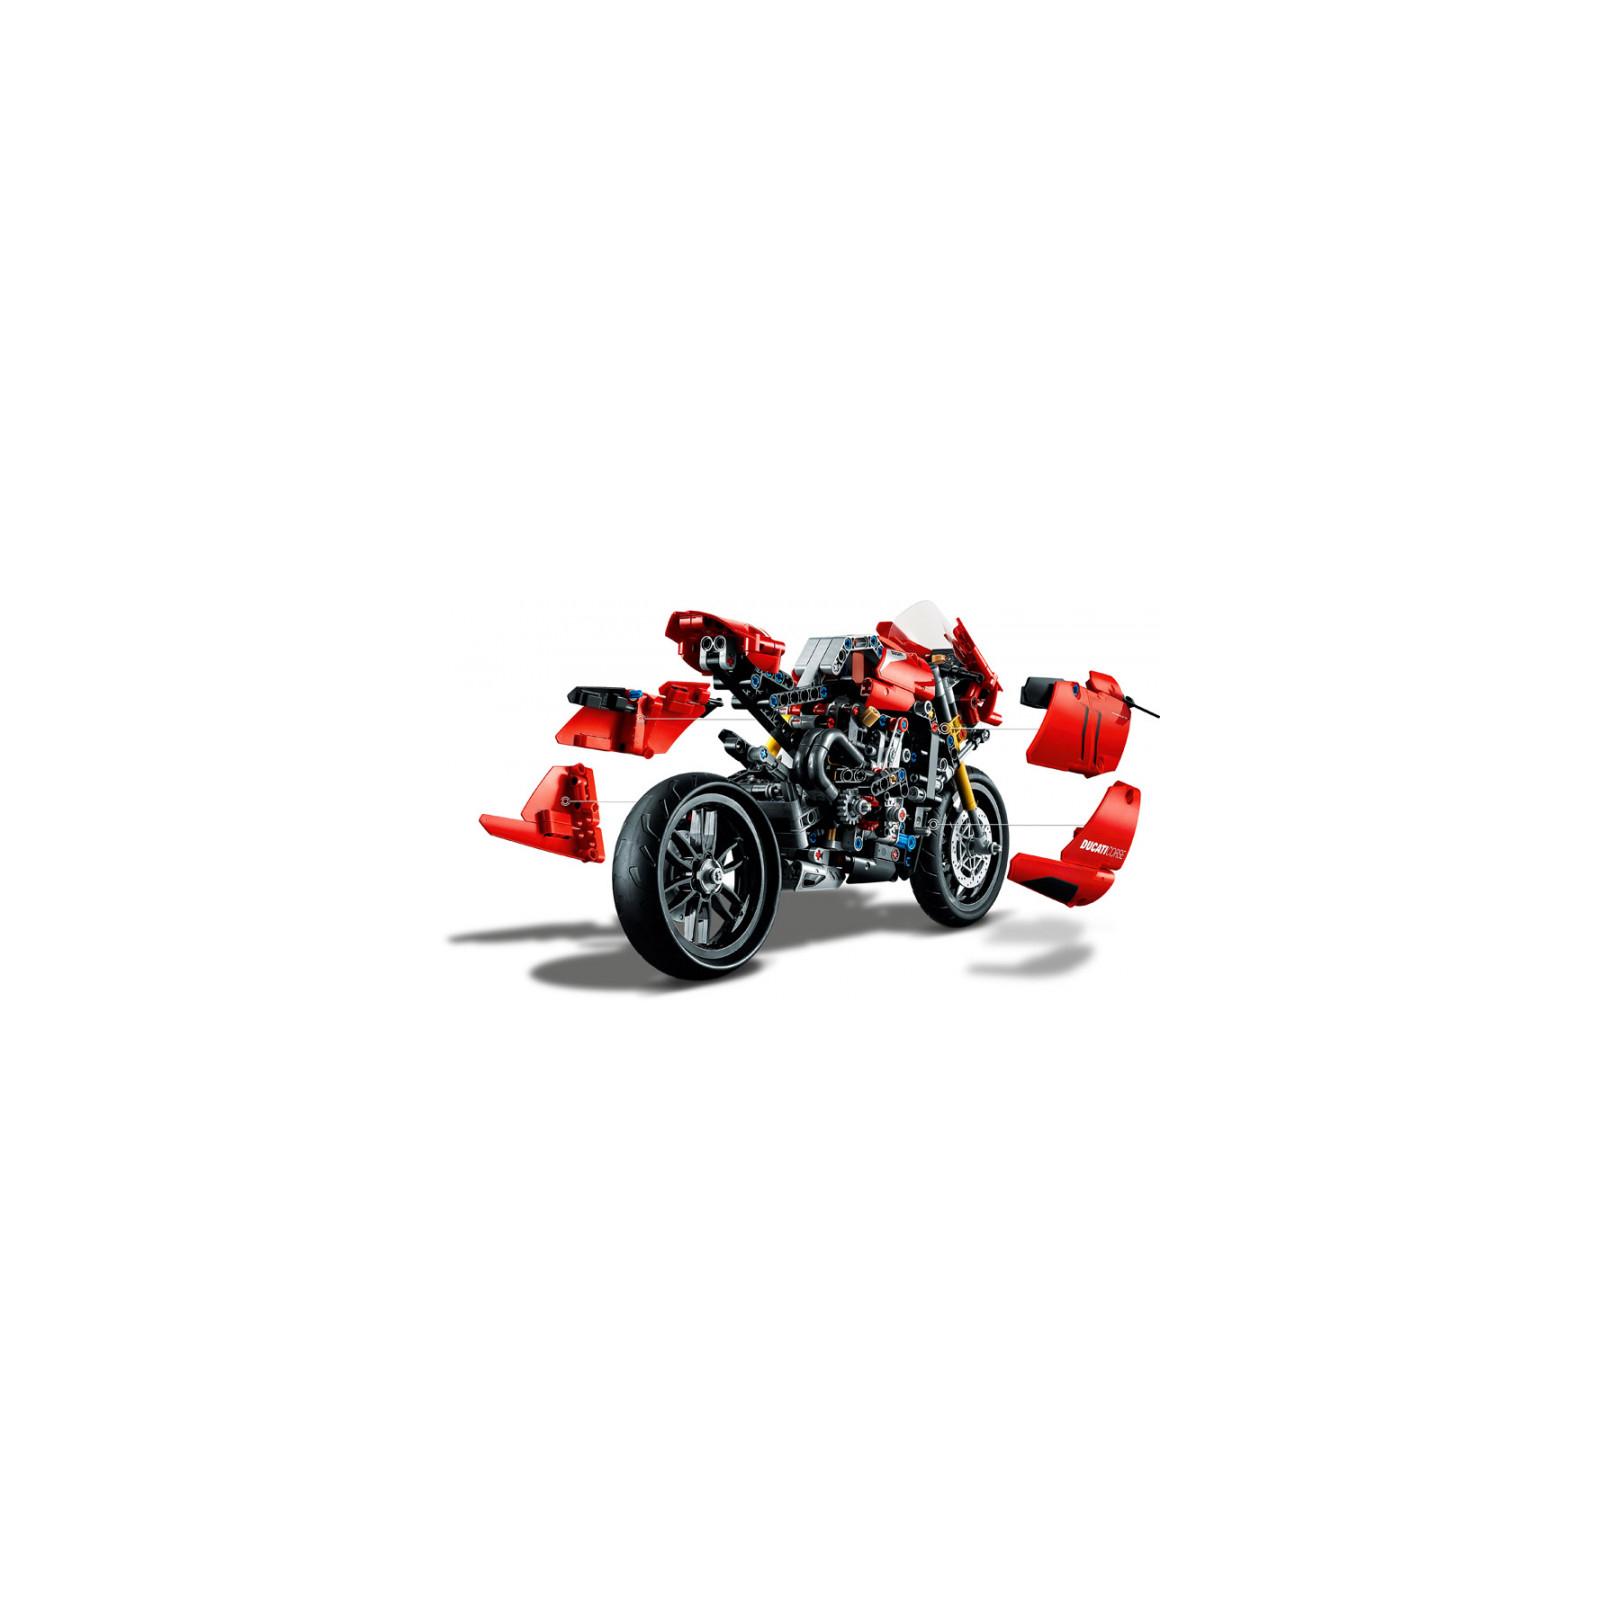 Конструктор LEGO Technic Ducati Panigale V4 R 0 646 детали (42107) изображение 5